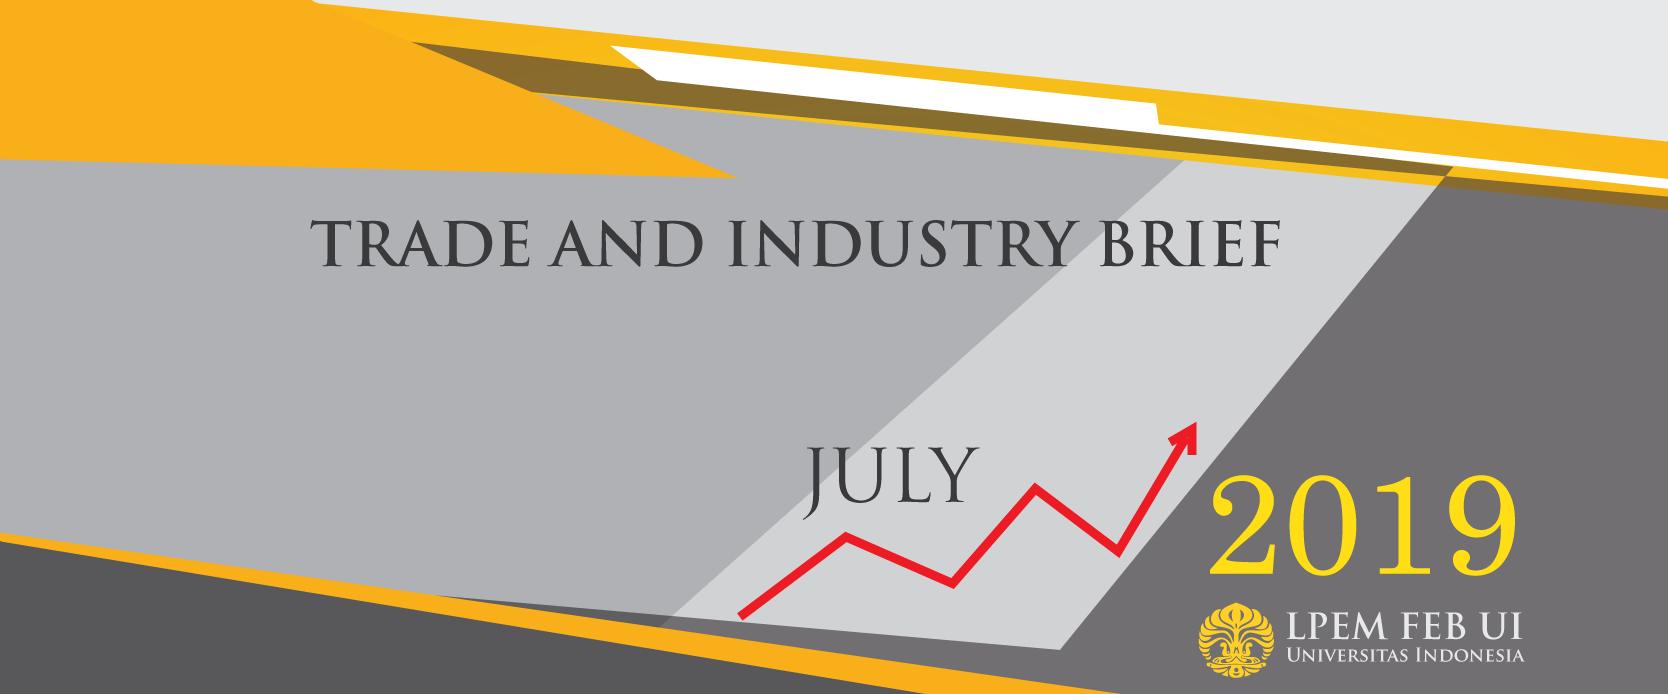 SERI ANALISIS EKONOMI: TRADE AND INDUSTRY BRIEF, Juli 2019